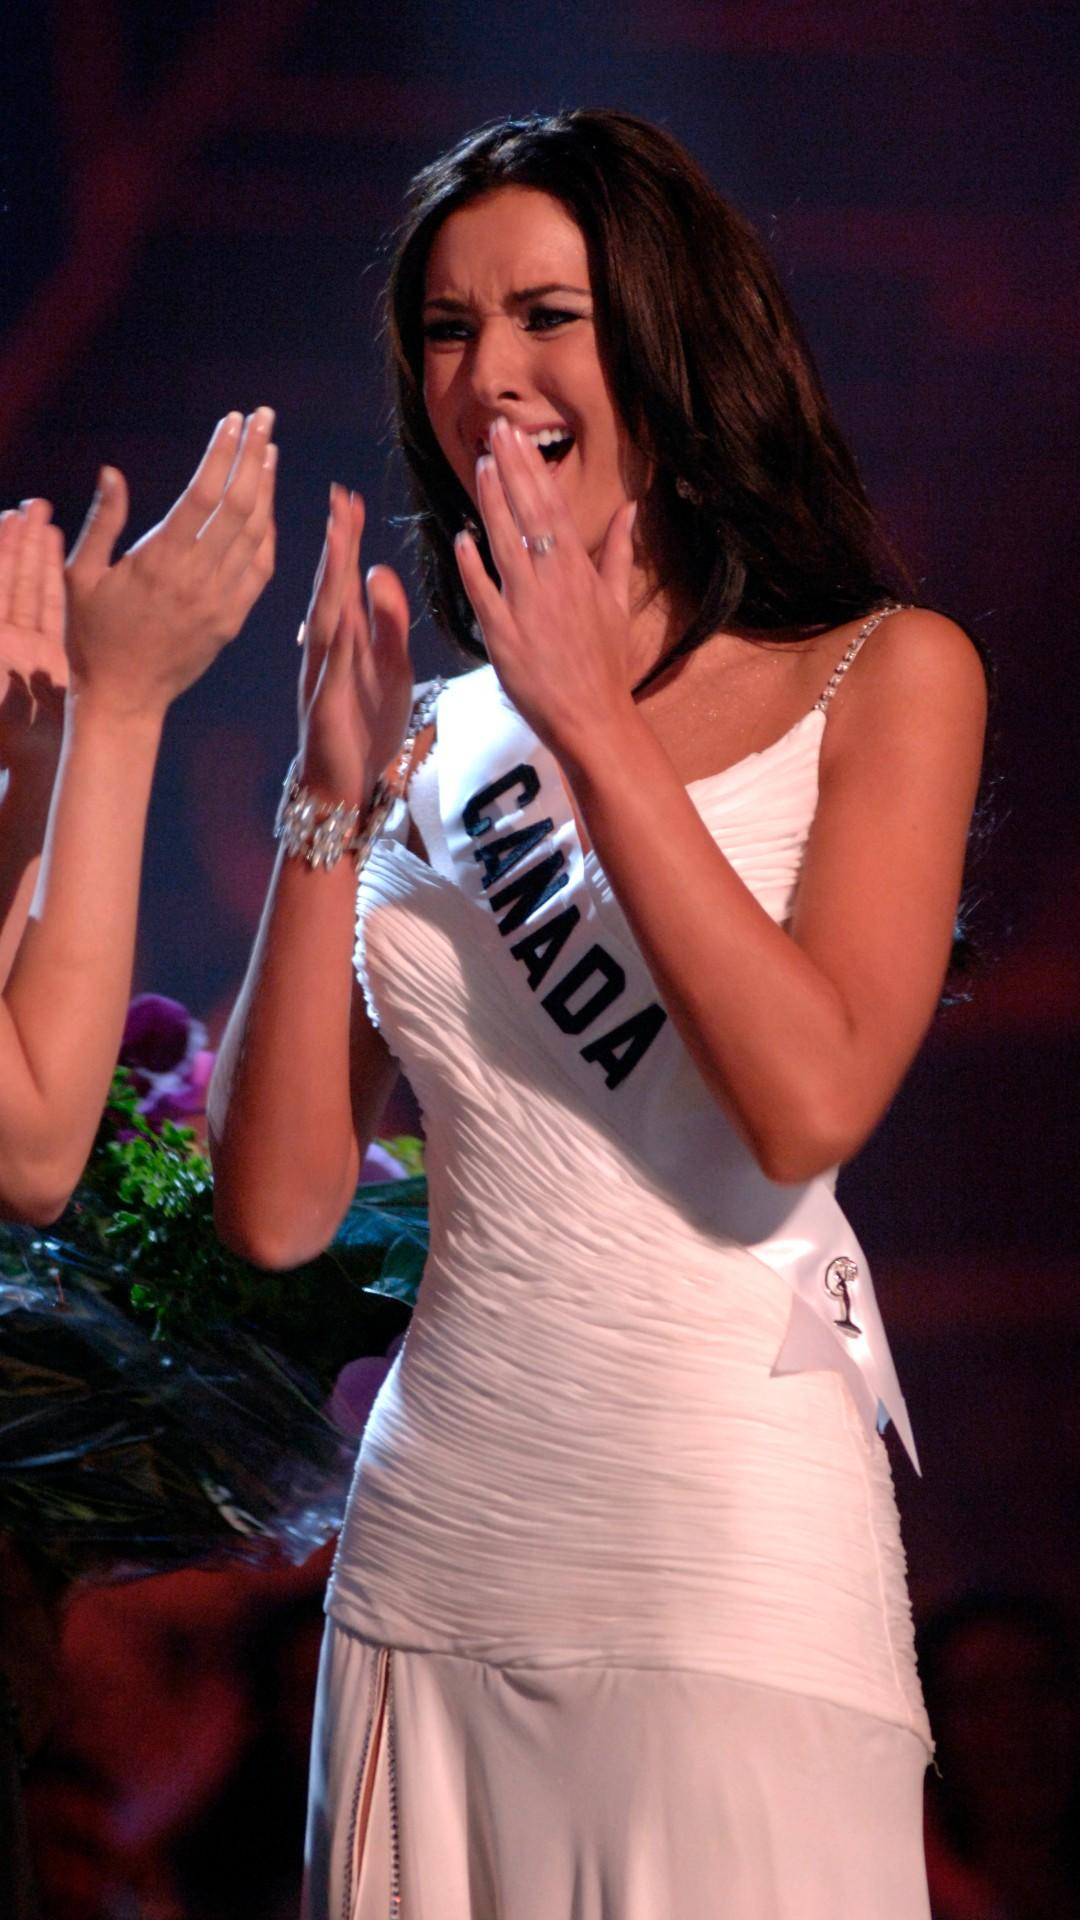 RECORDANDO REACCIONES DE REINAS DE BELLEZA Natalie-glebova-miss-canada-2005-miss-universo-2019